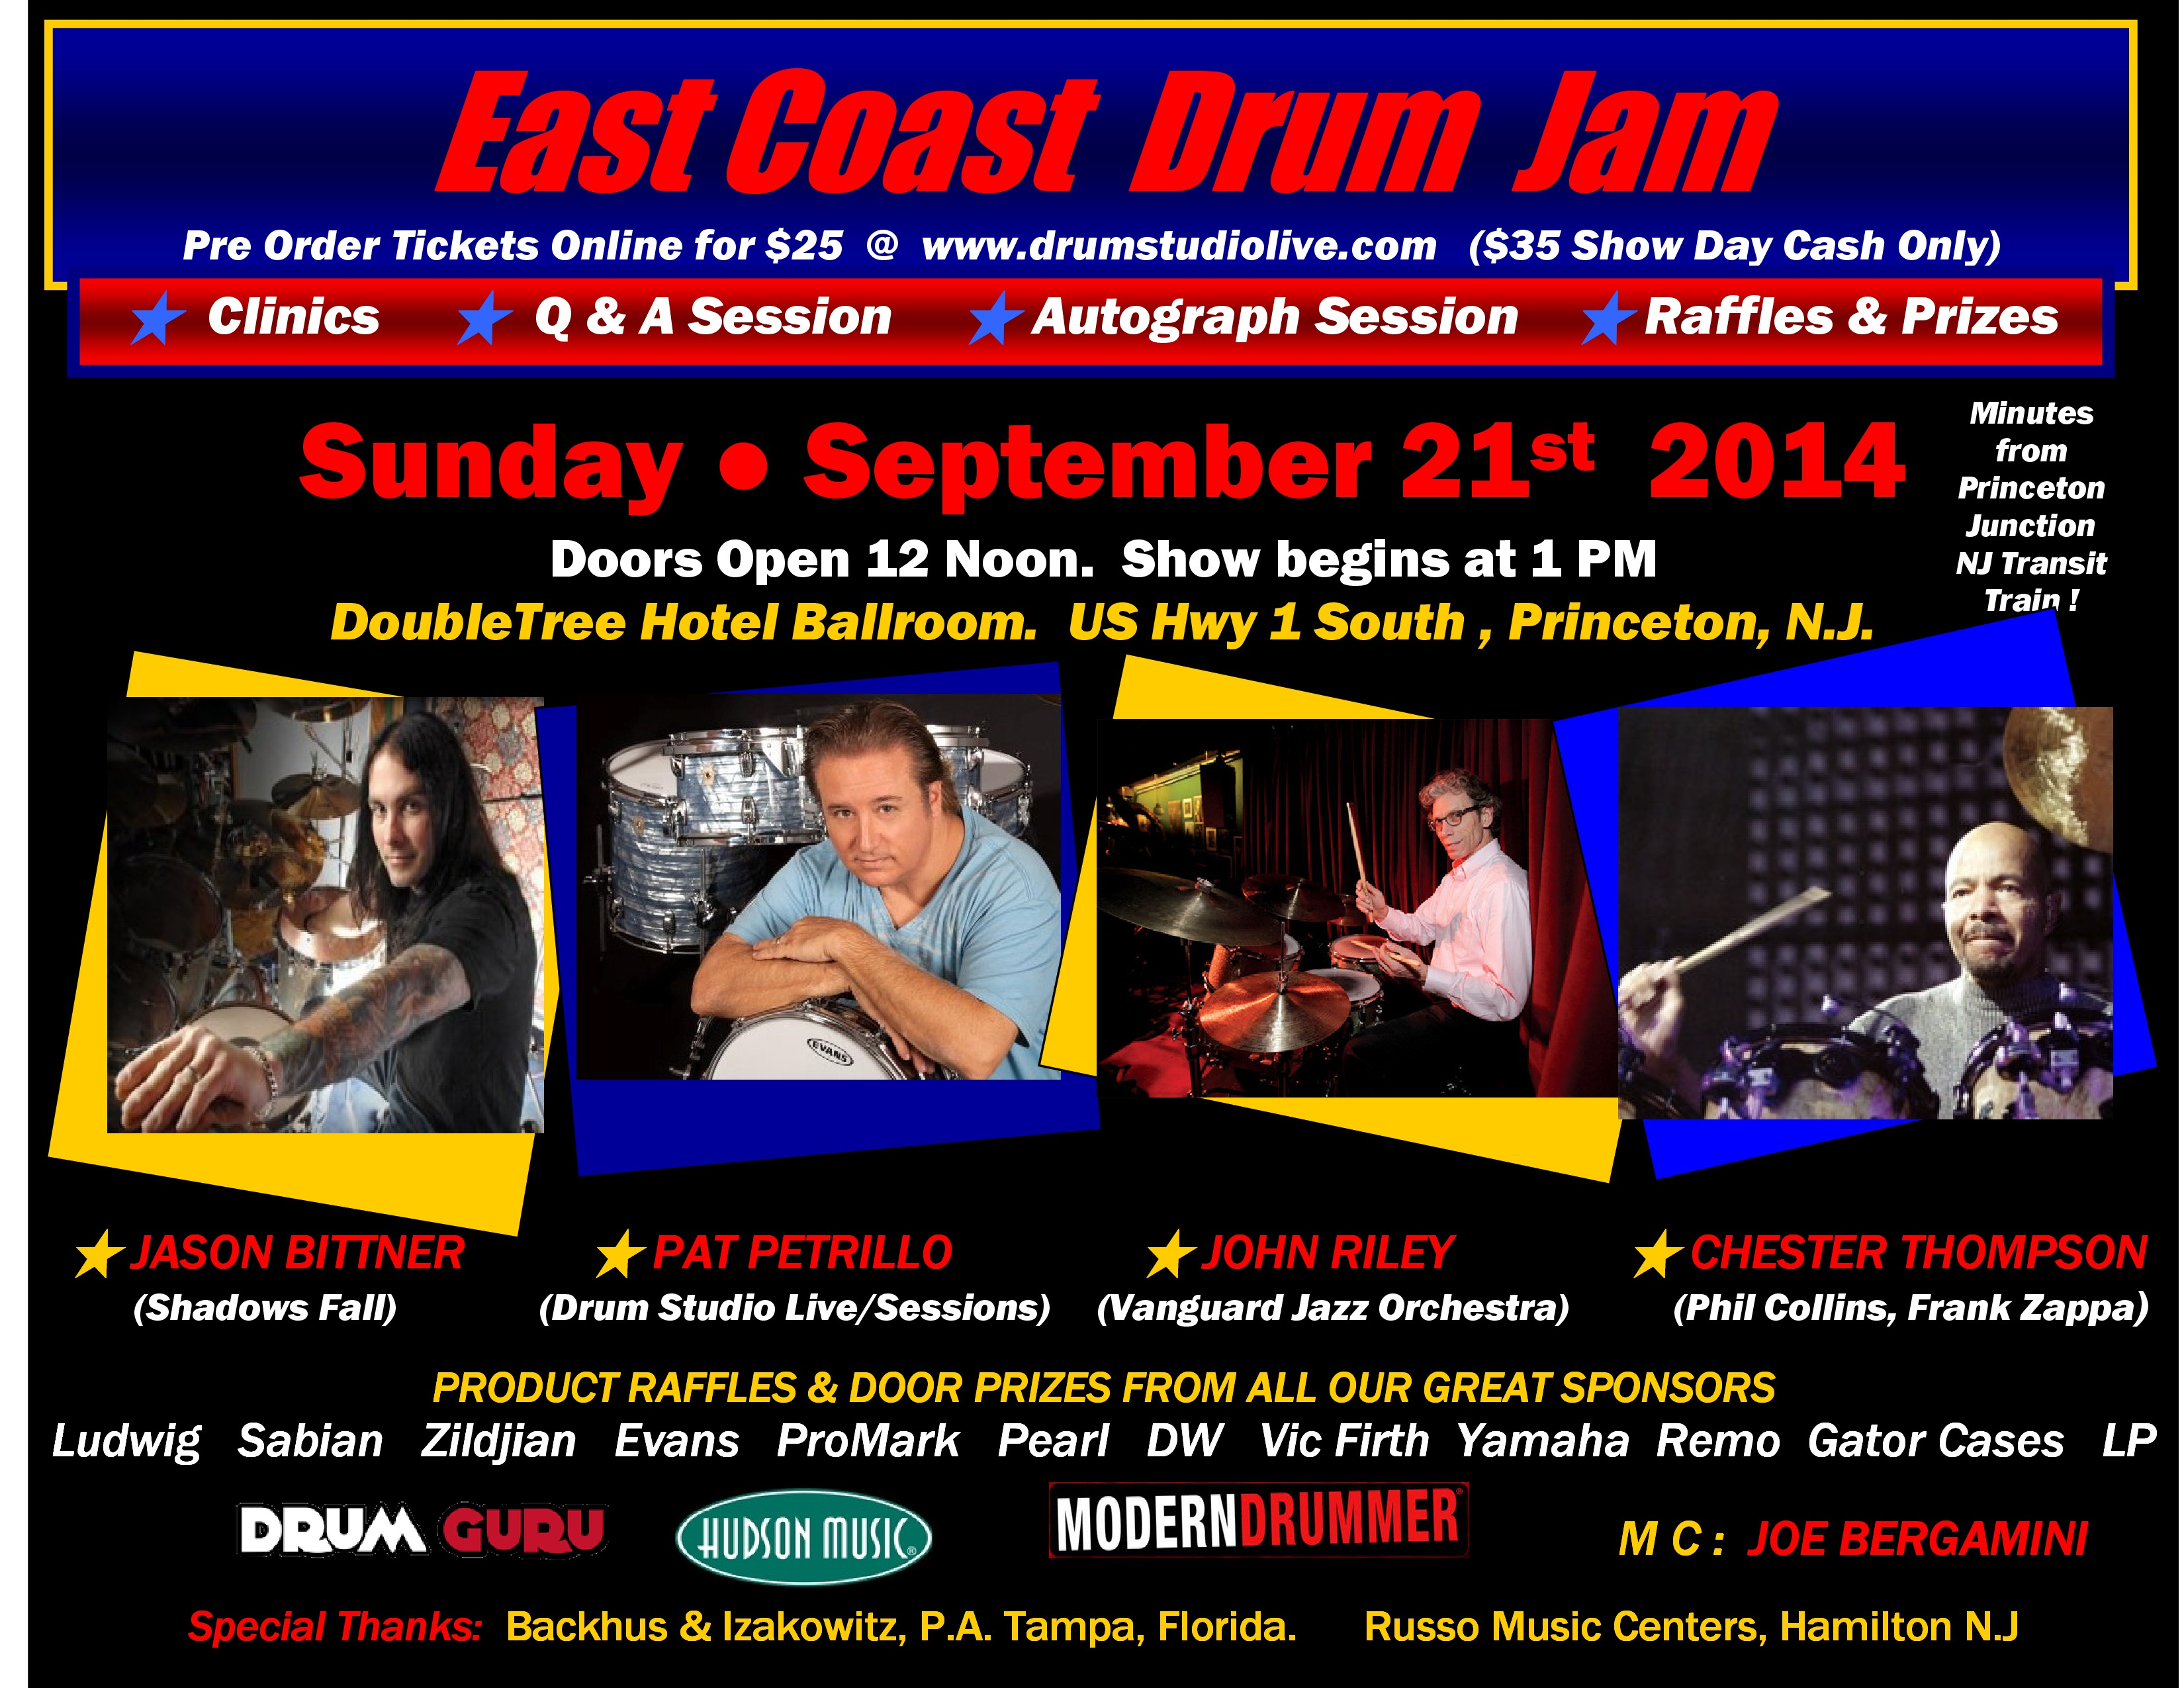 East Coast Drum Jam Set for September 21st